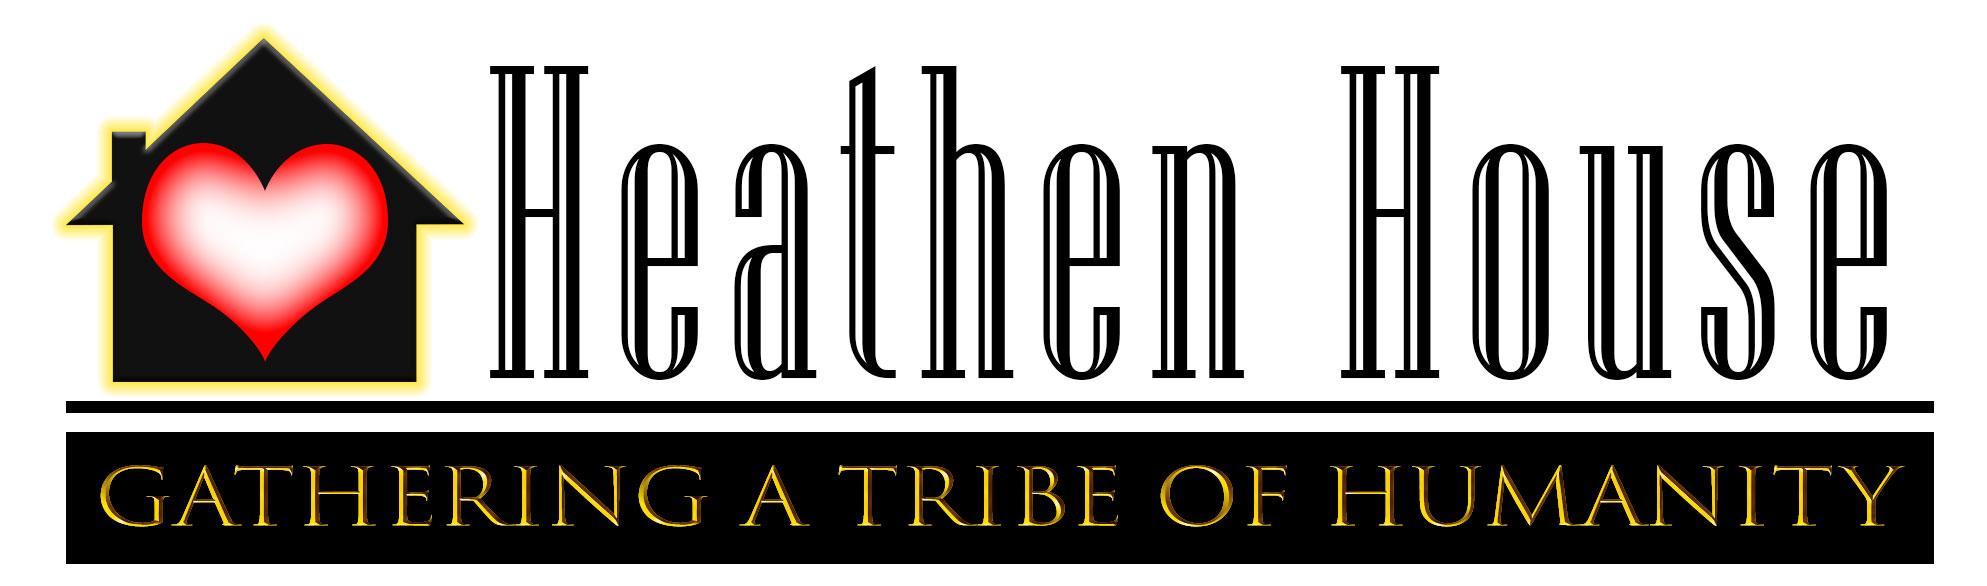 Heathen House International